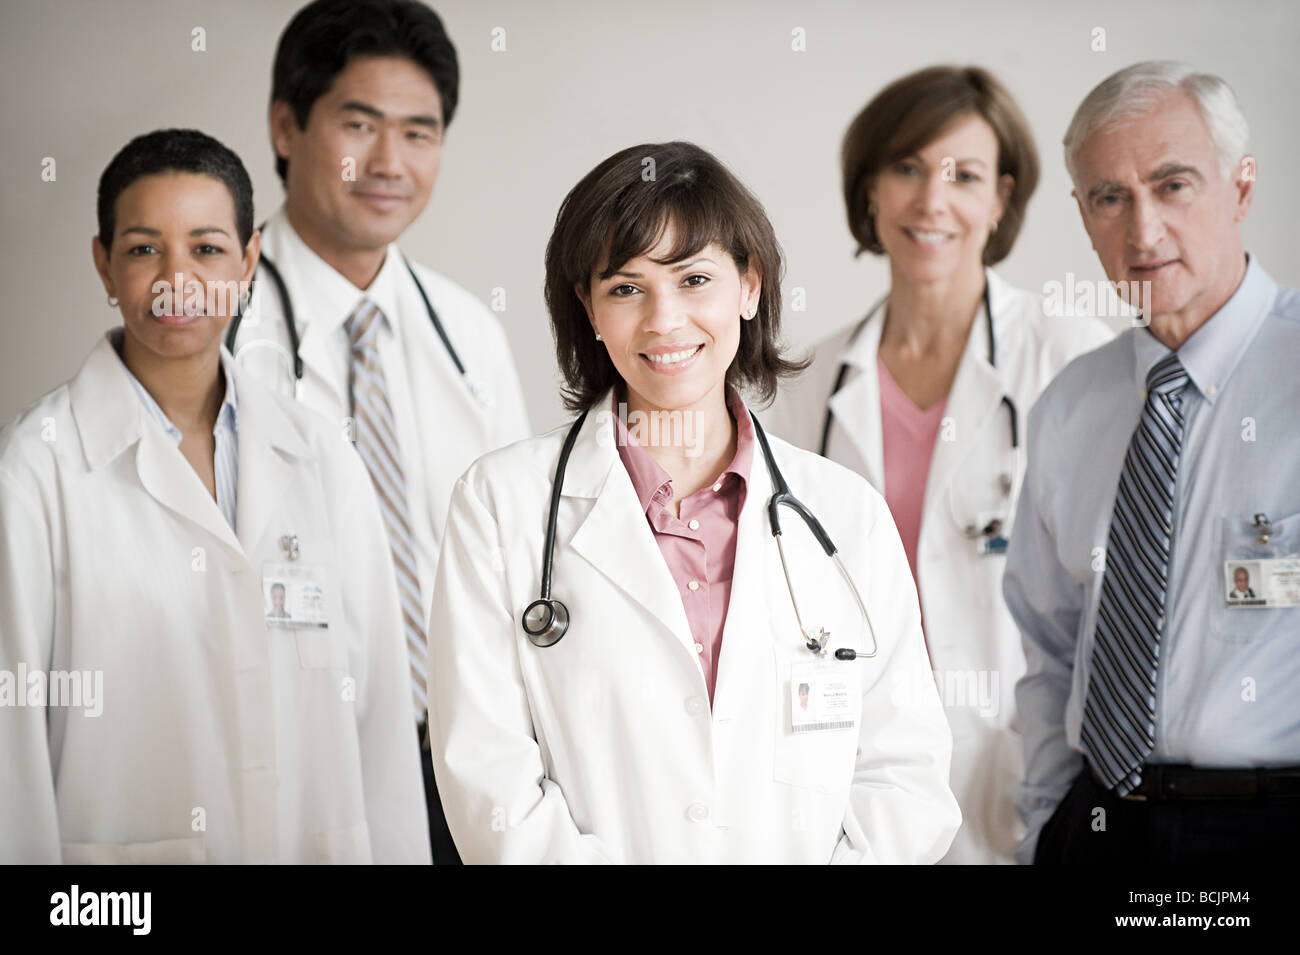 Doctors - Stock Image